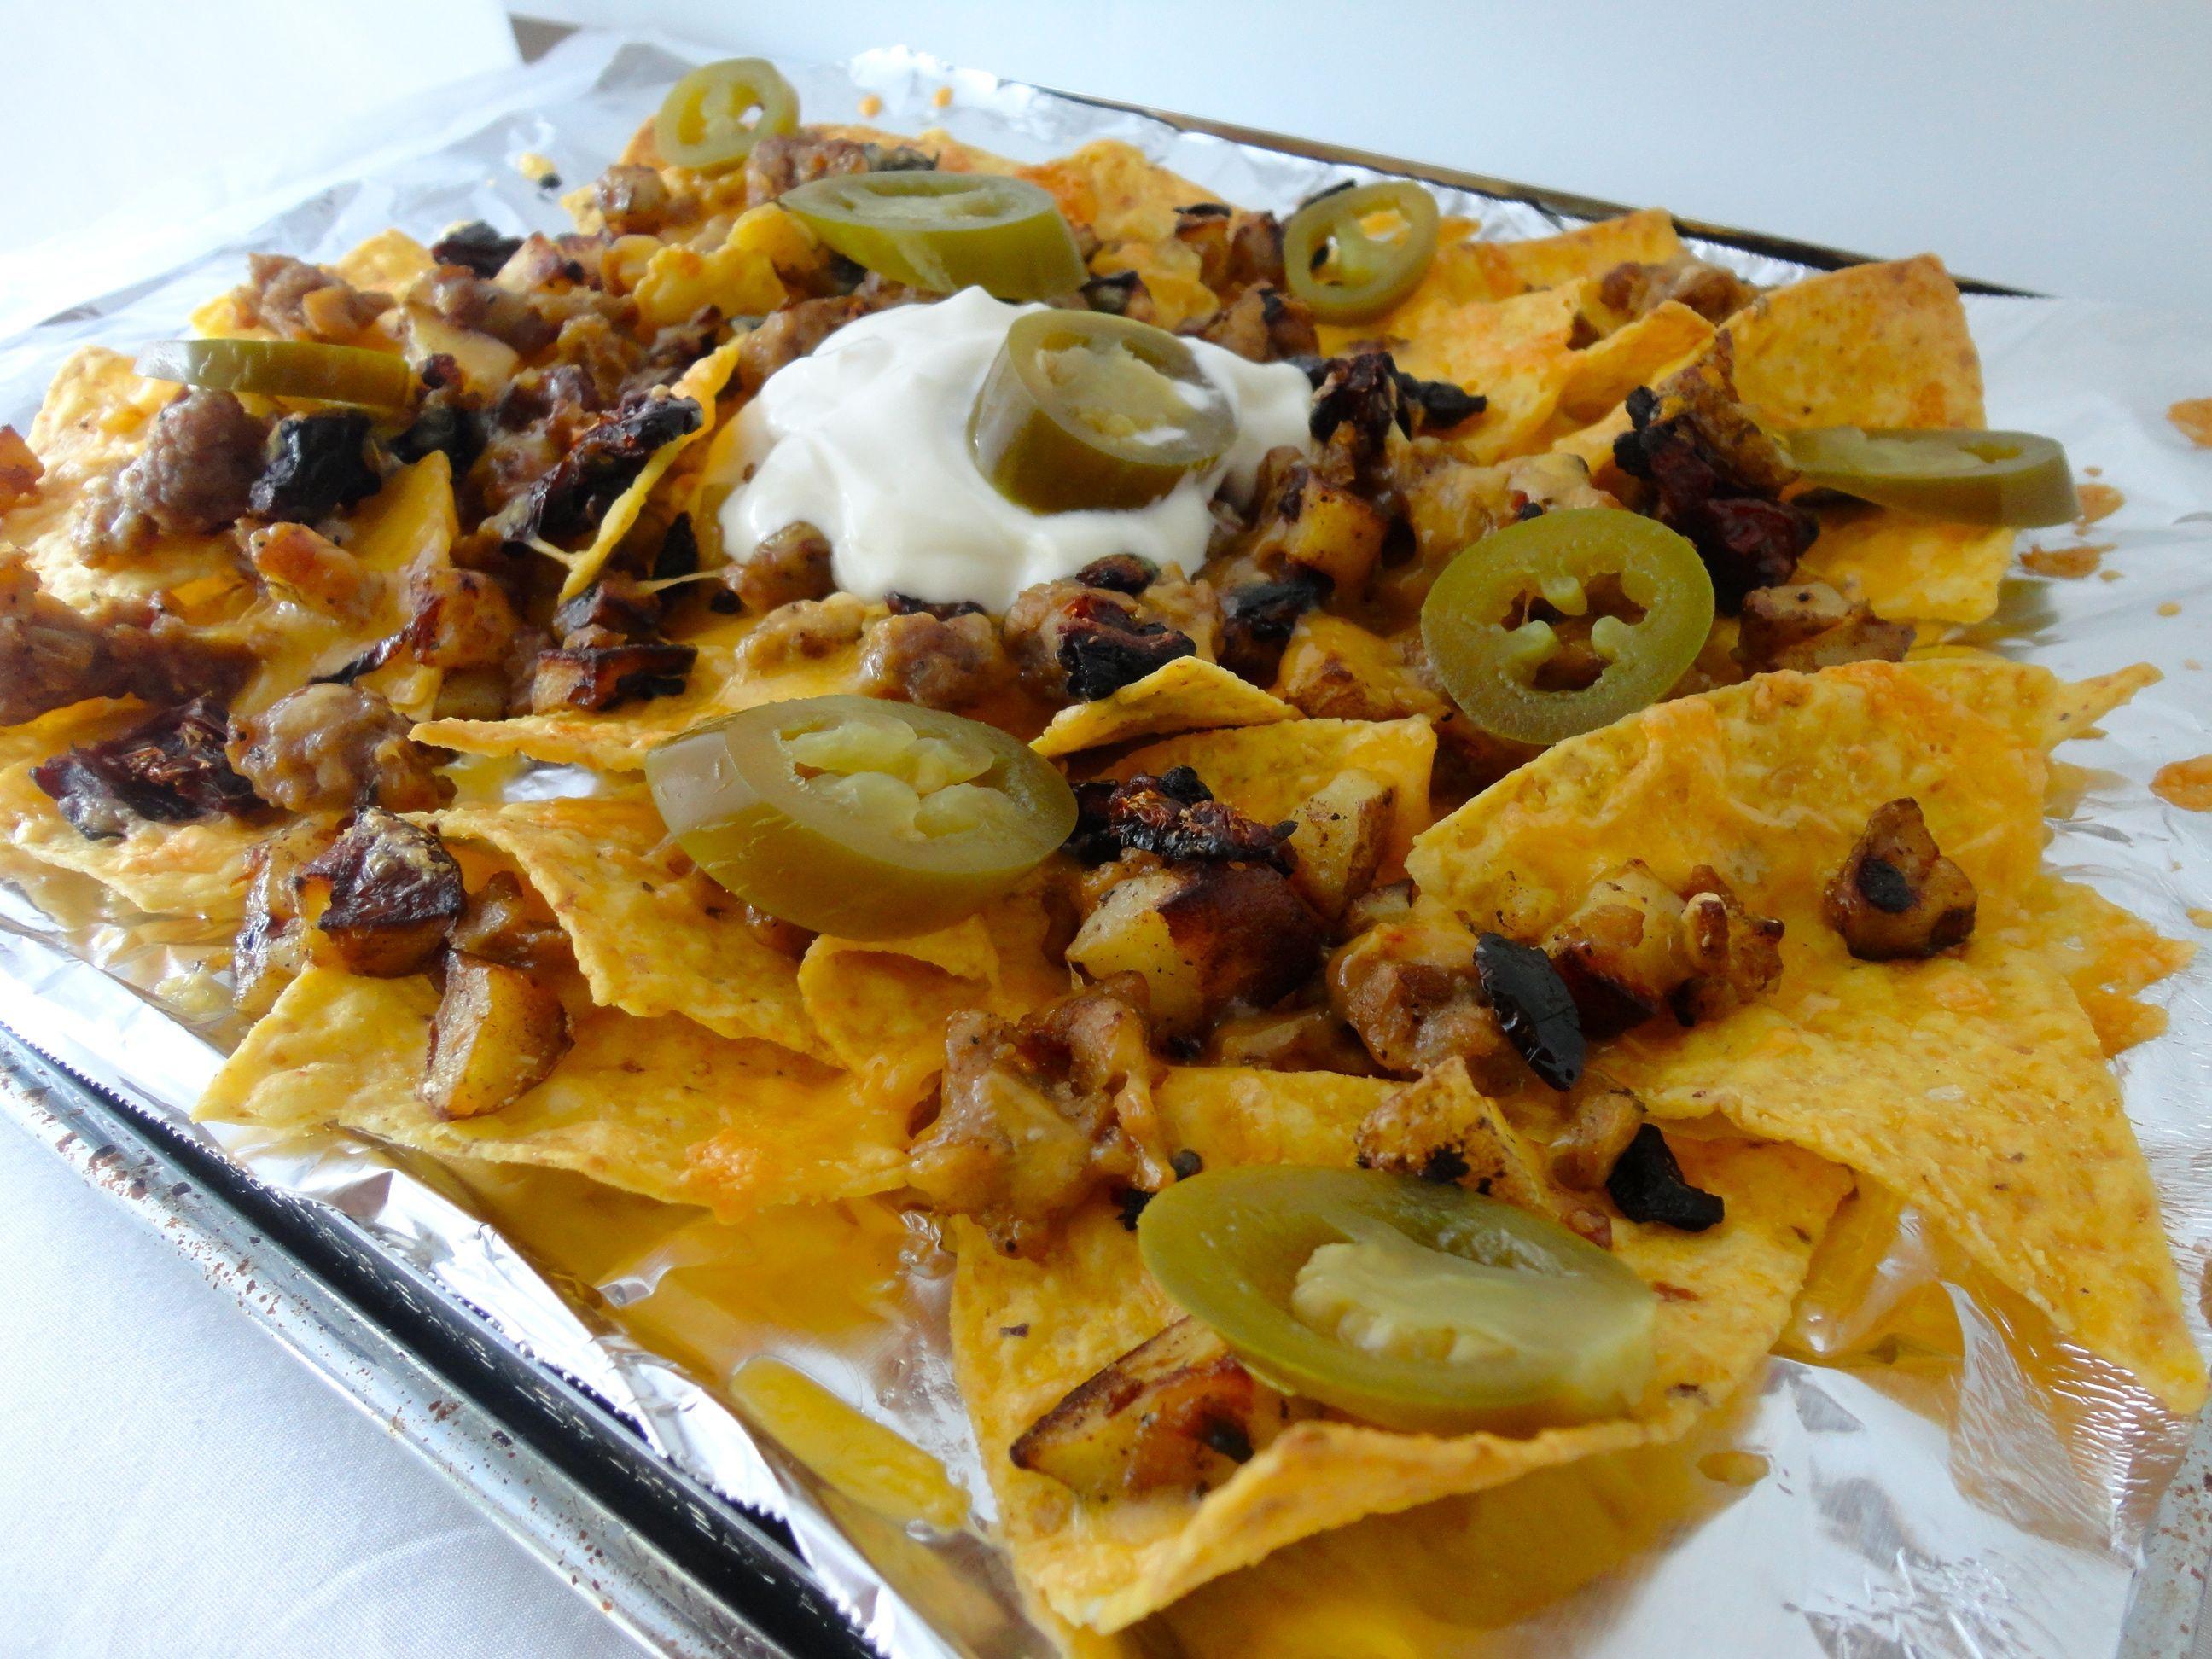 ... royalty-free-stock-photos-nachos-meat-cheese-macro-shot-image27117988